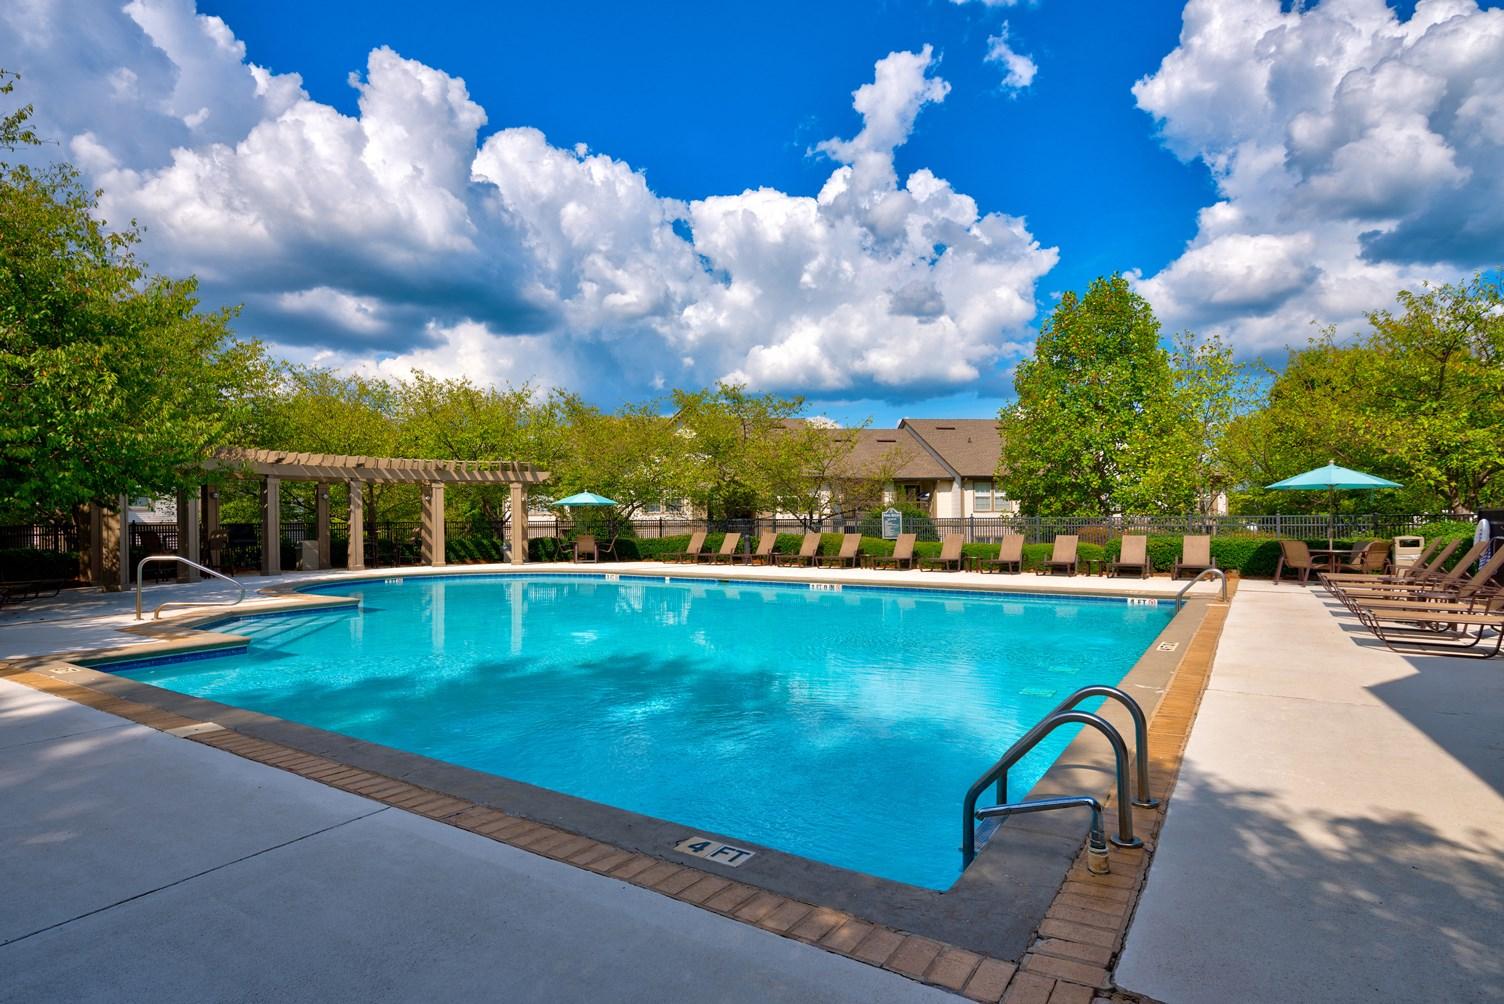 Swimming Pool at 150 Summit Apartments in Birmingham, AL